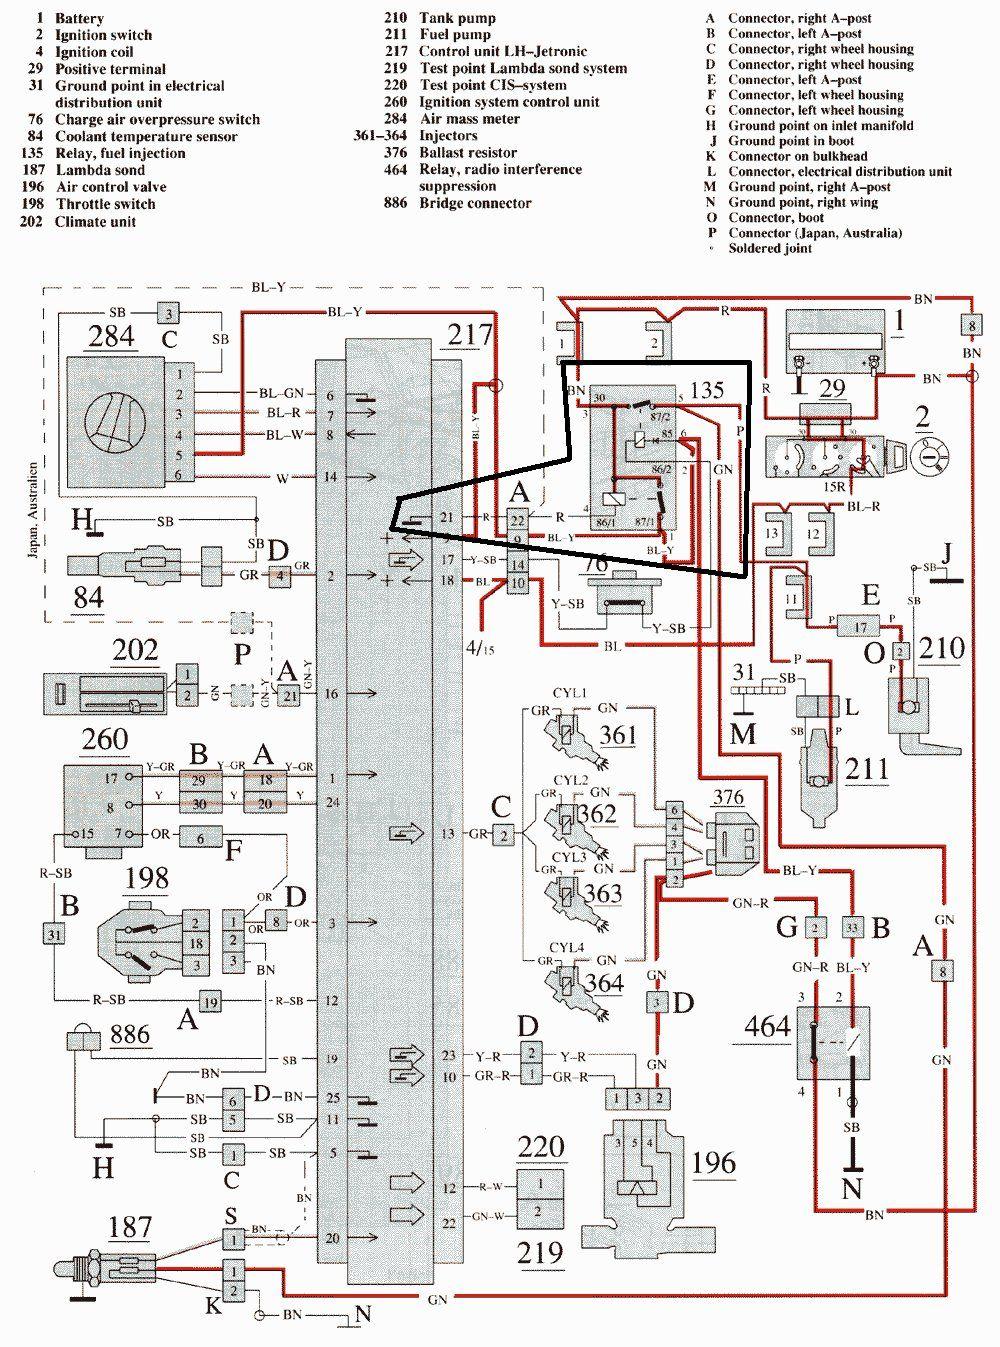 kr_1486] volvo 740 wiring diagram pdf free diagram  gentot clesi inama mohammedshrine librar wiring 101